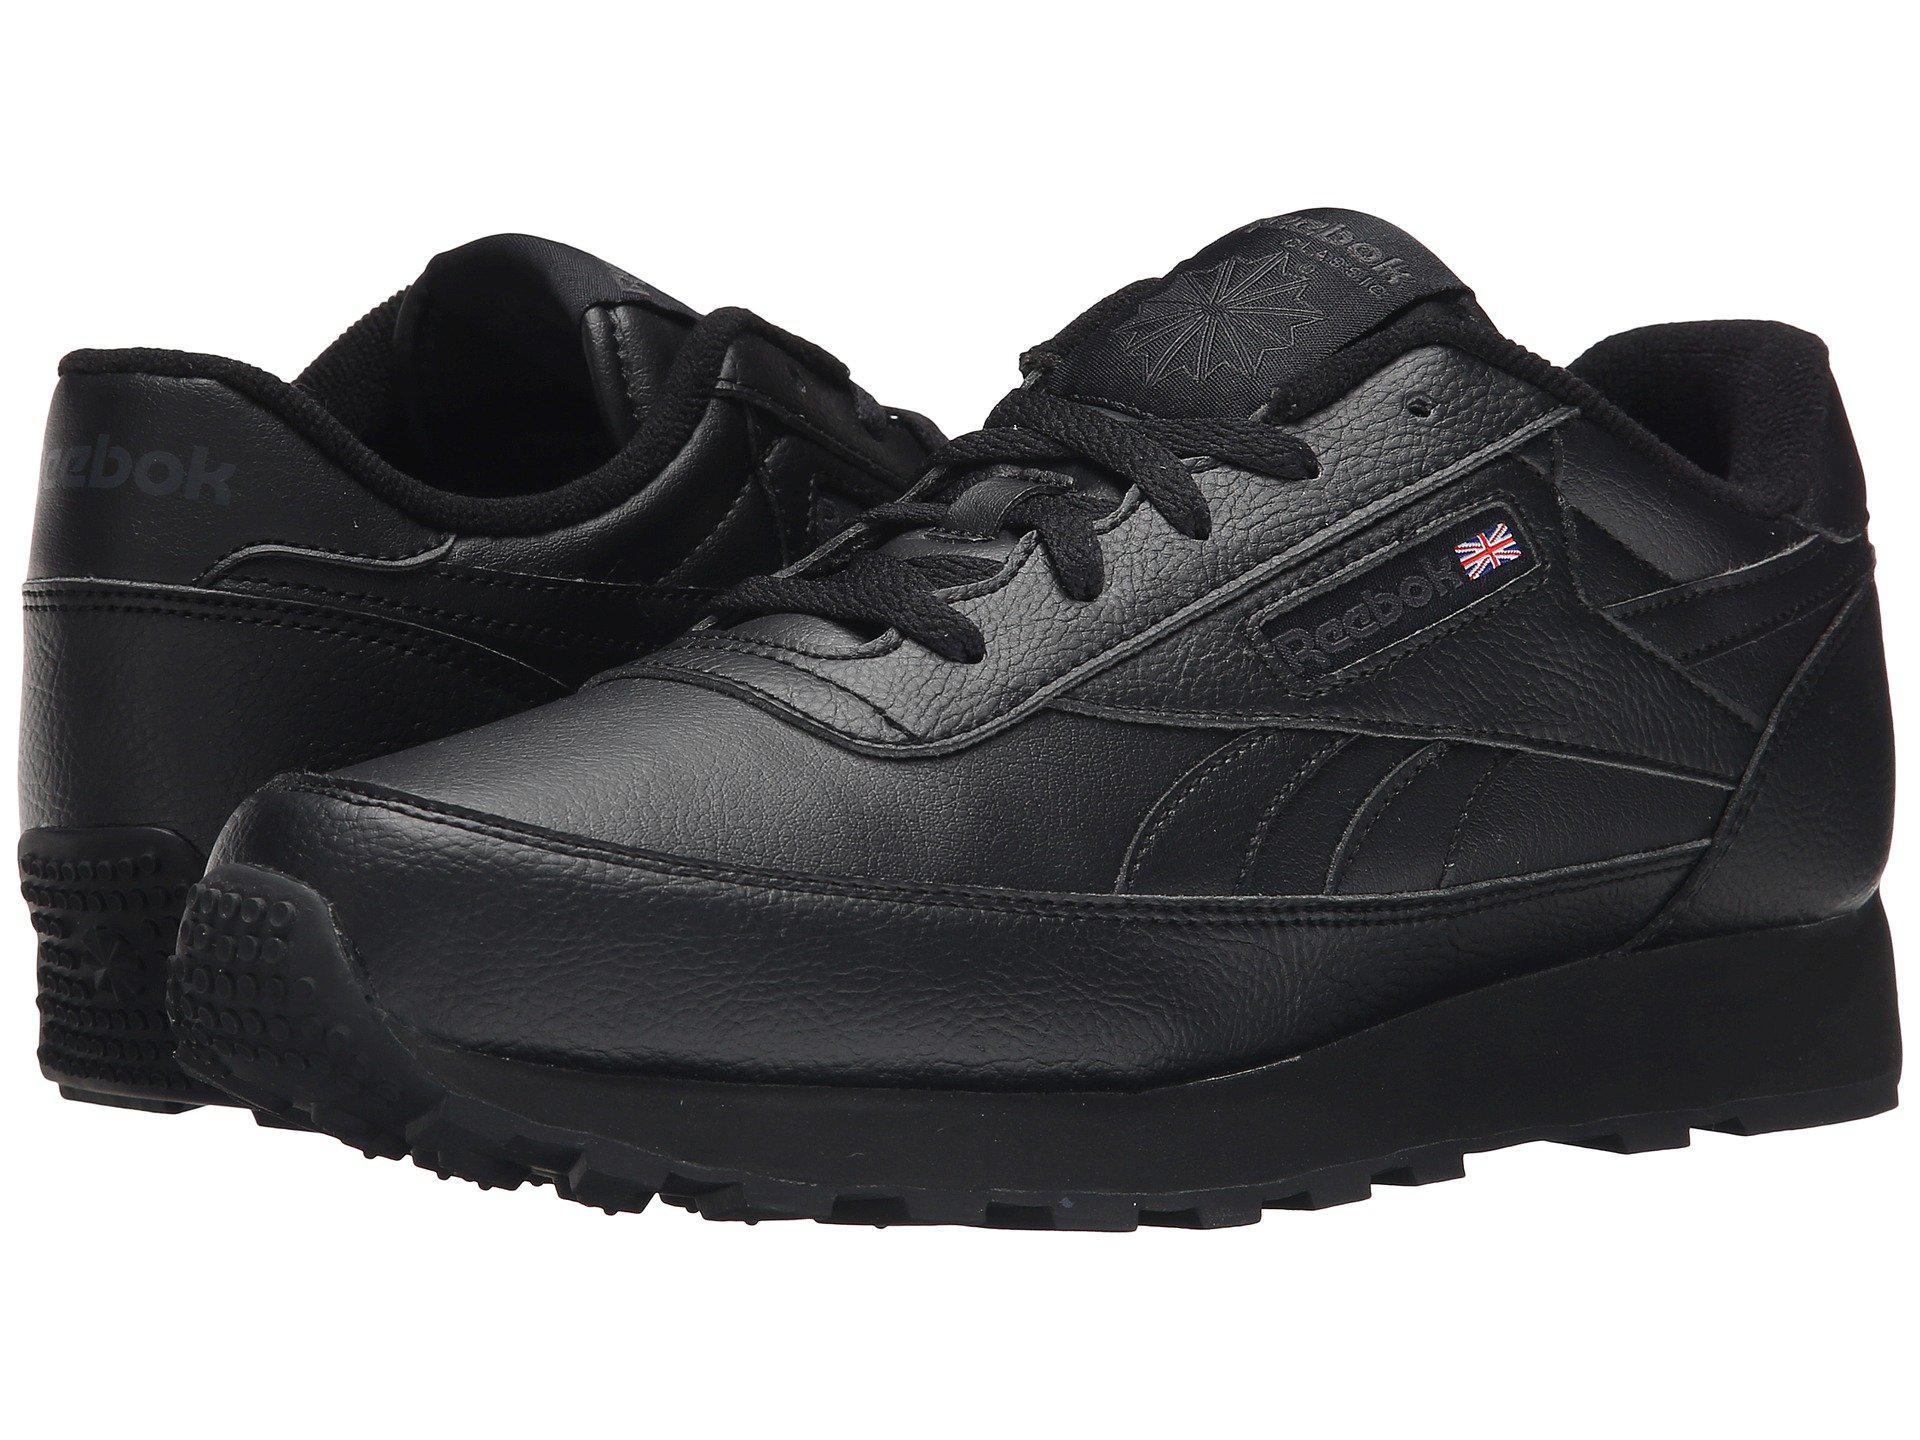 44001e56d59 Lyst - Reebok Classic Renaissance in Black for Men